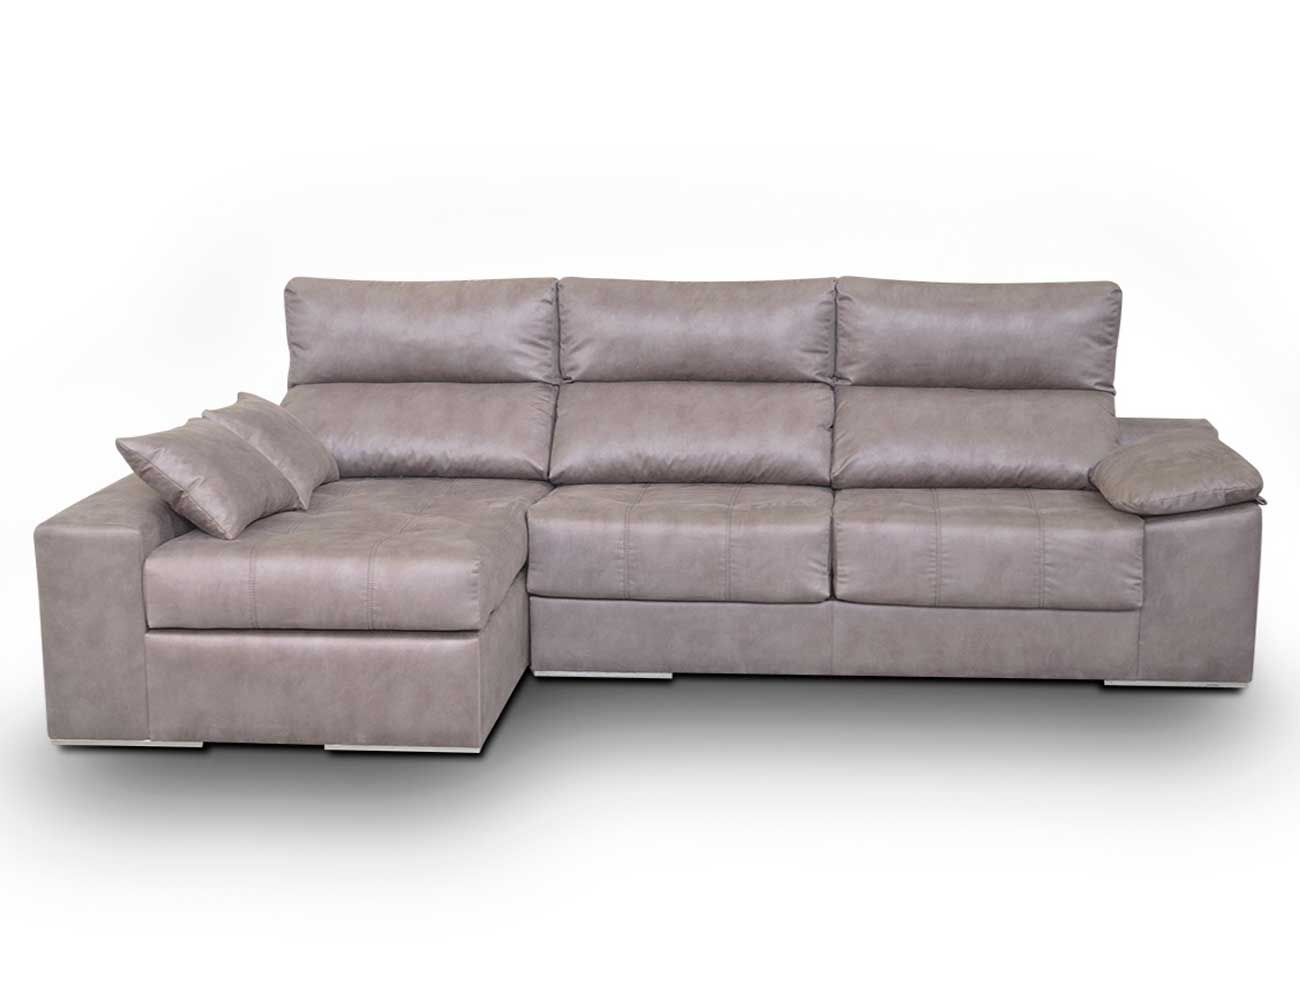 4938_sofa chaiselongue moderno asientos extraibles muy comodo dobles pespuntes donatella5